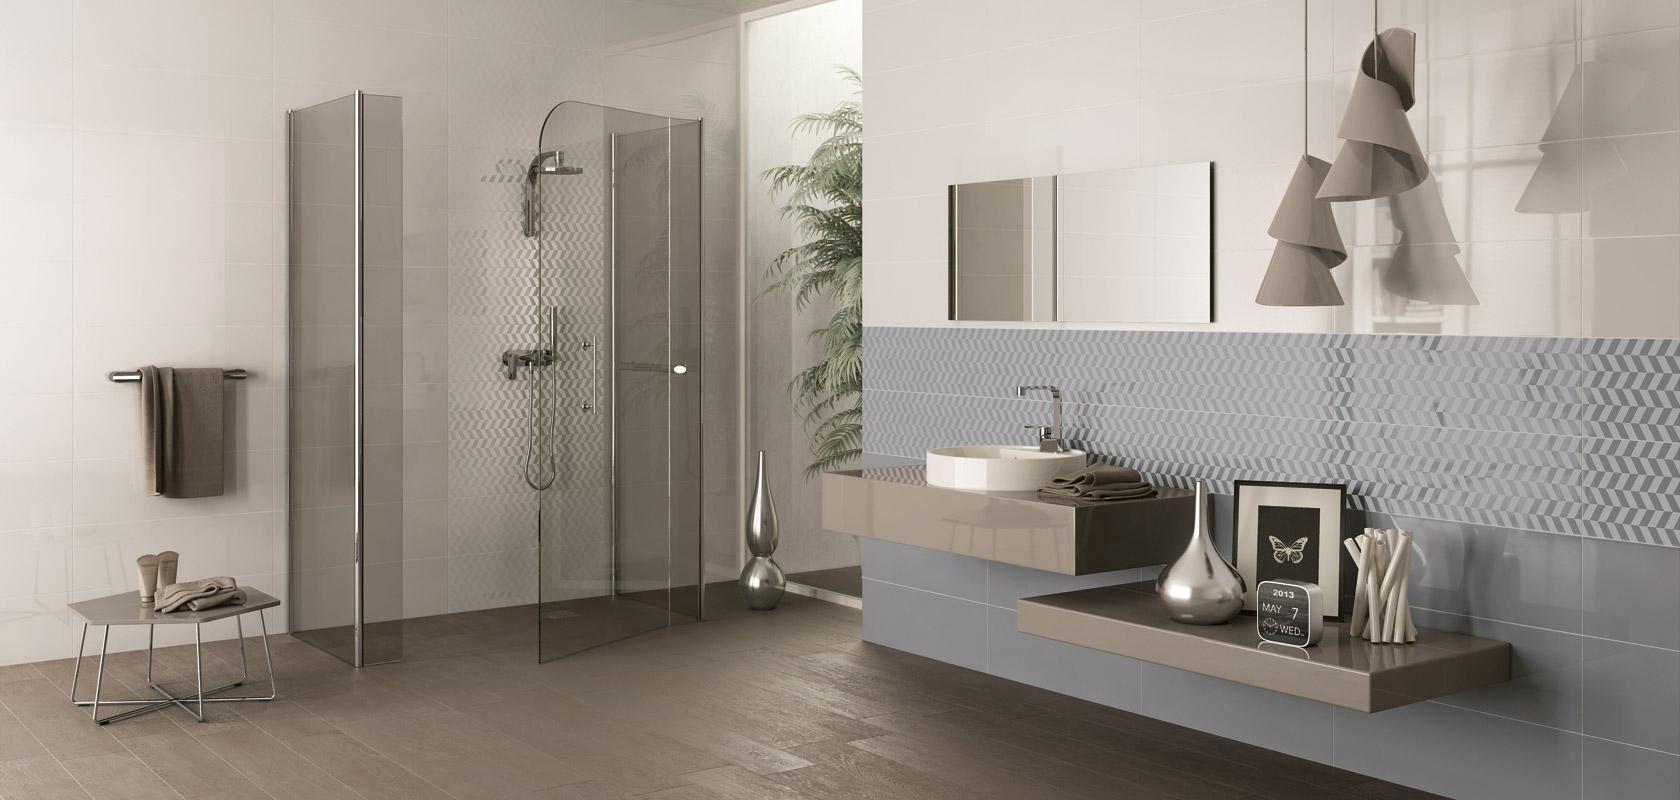 obklady do koupelny melody m b keramika. Black Bedroom Furniture Sets. Home Design Ideas